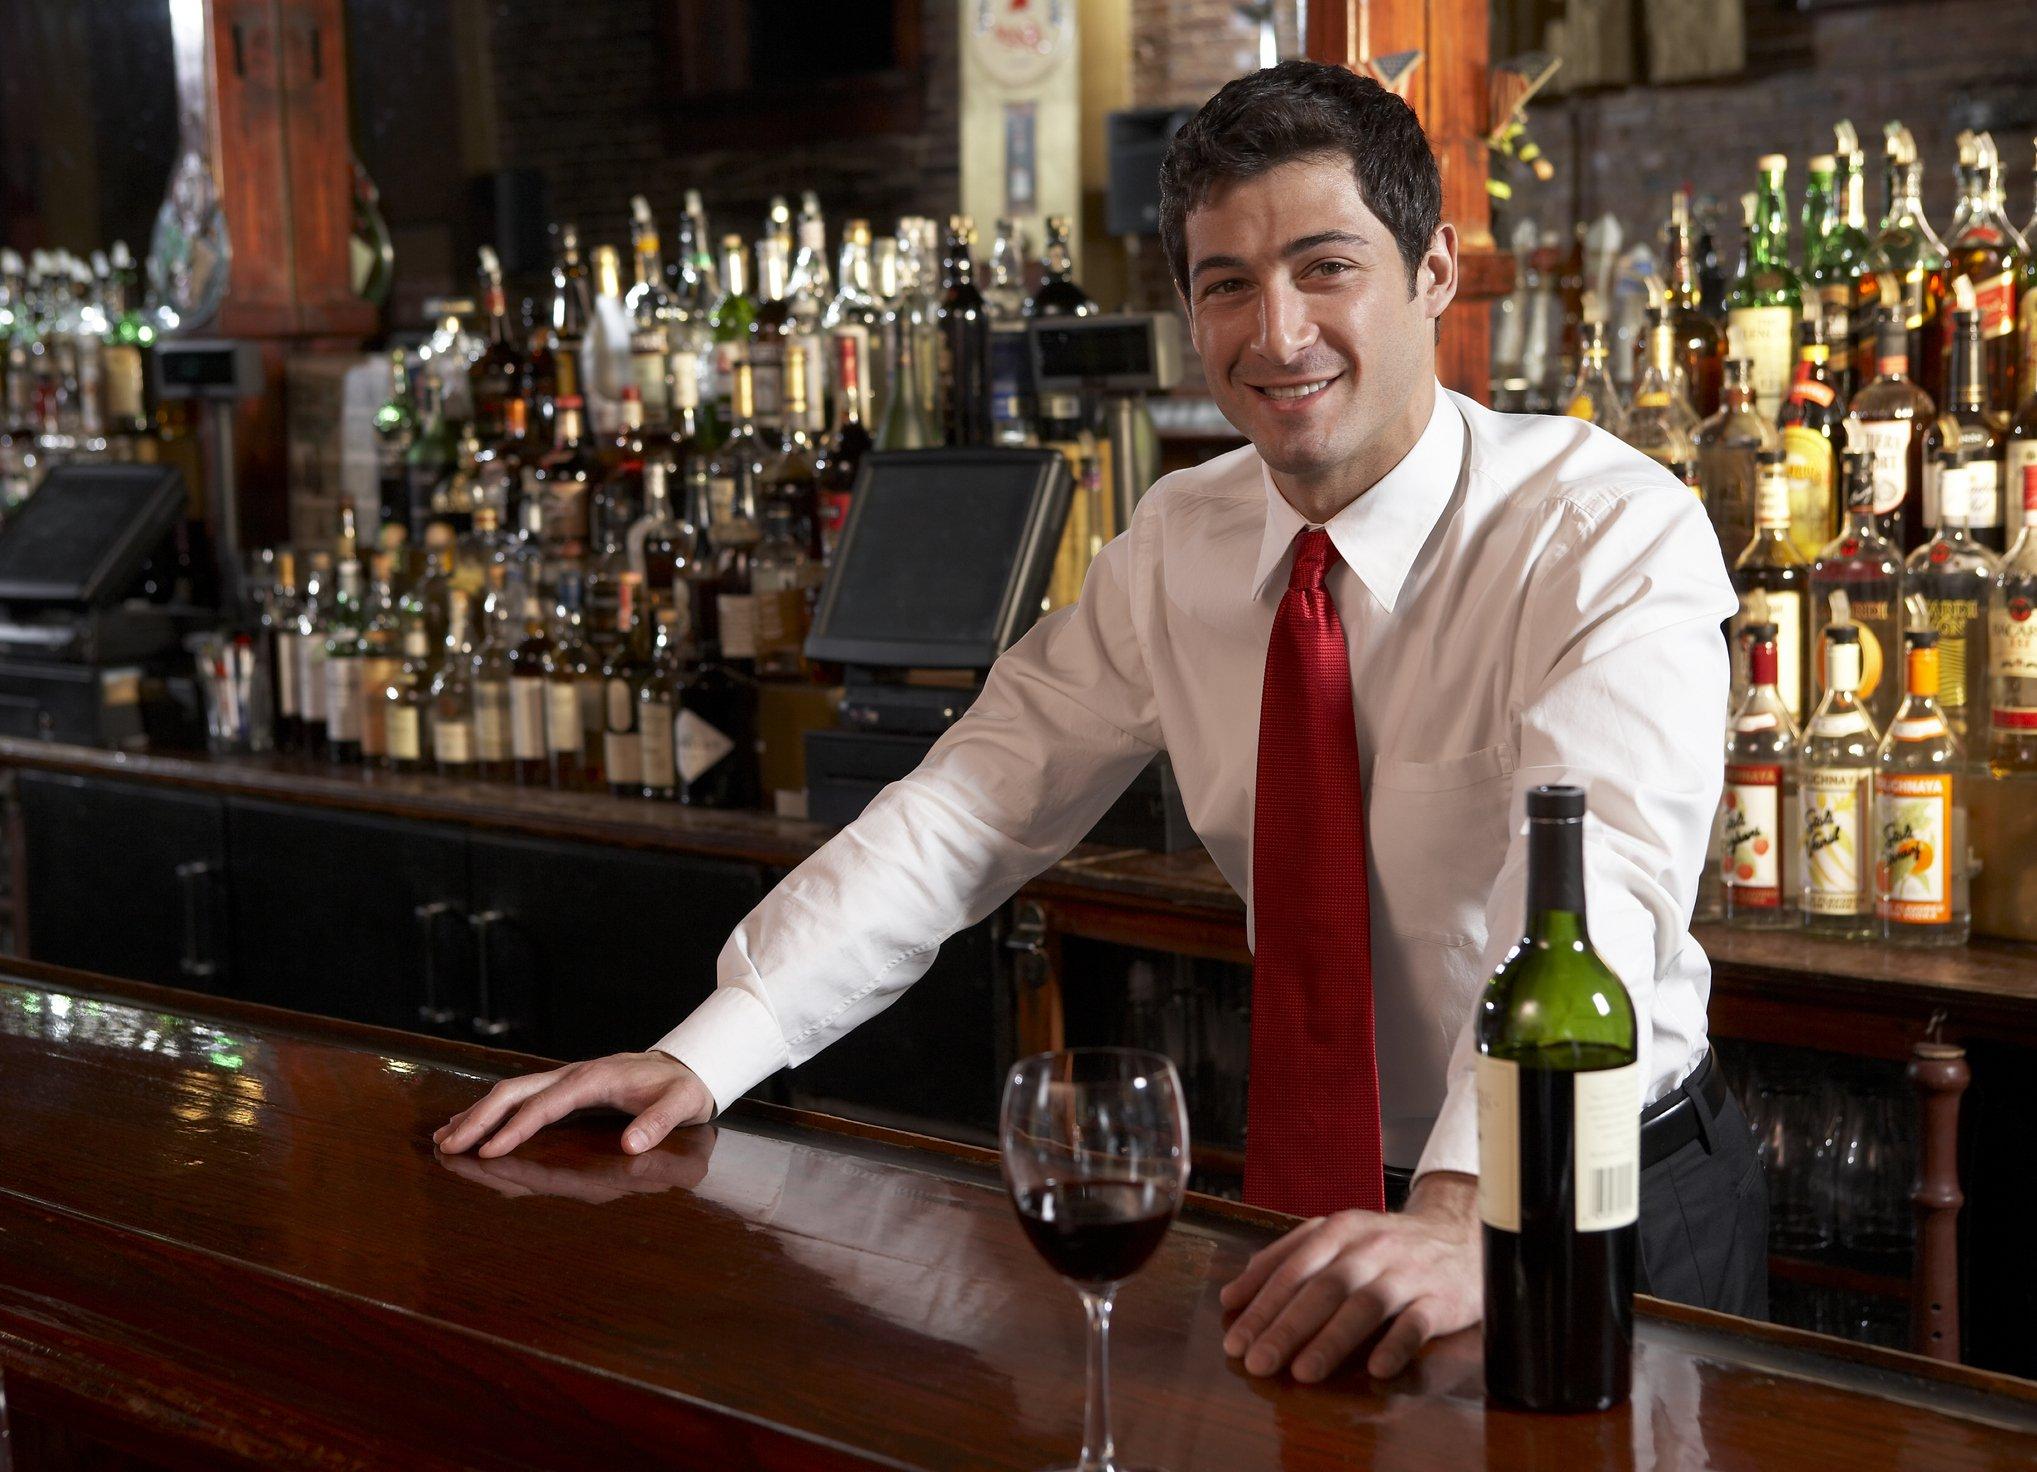 Bartender behind bar counter in pub, portrait